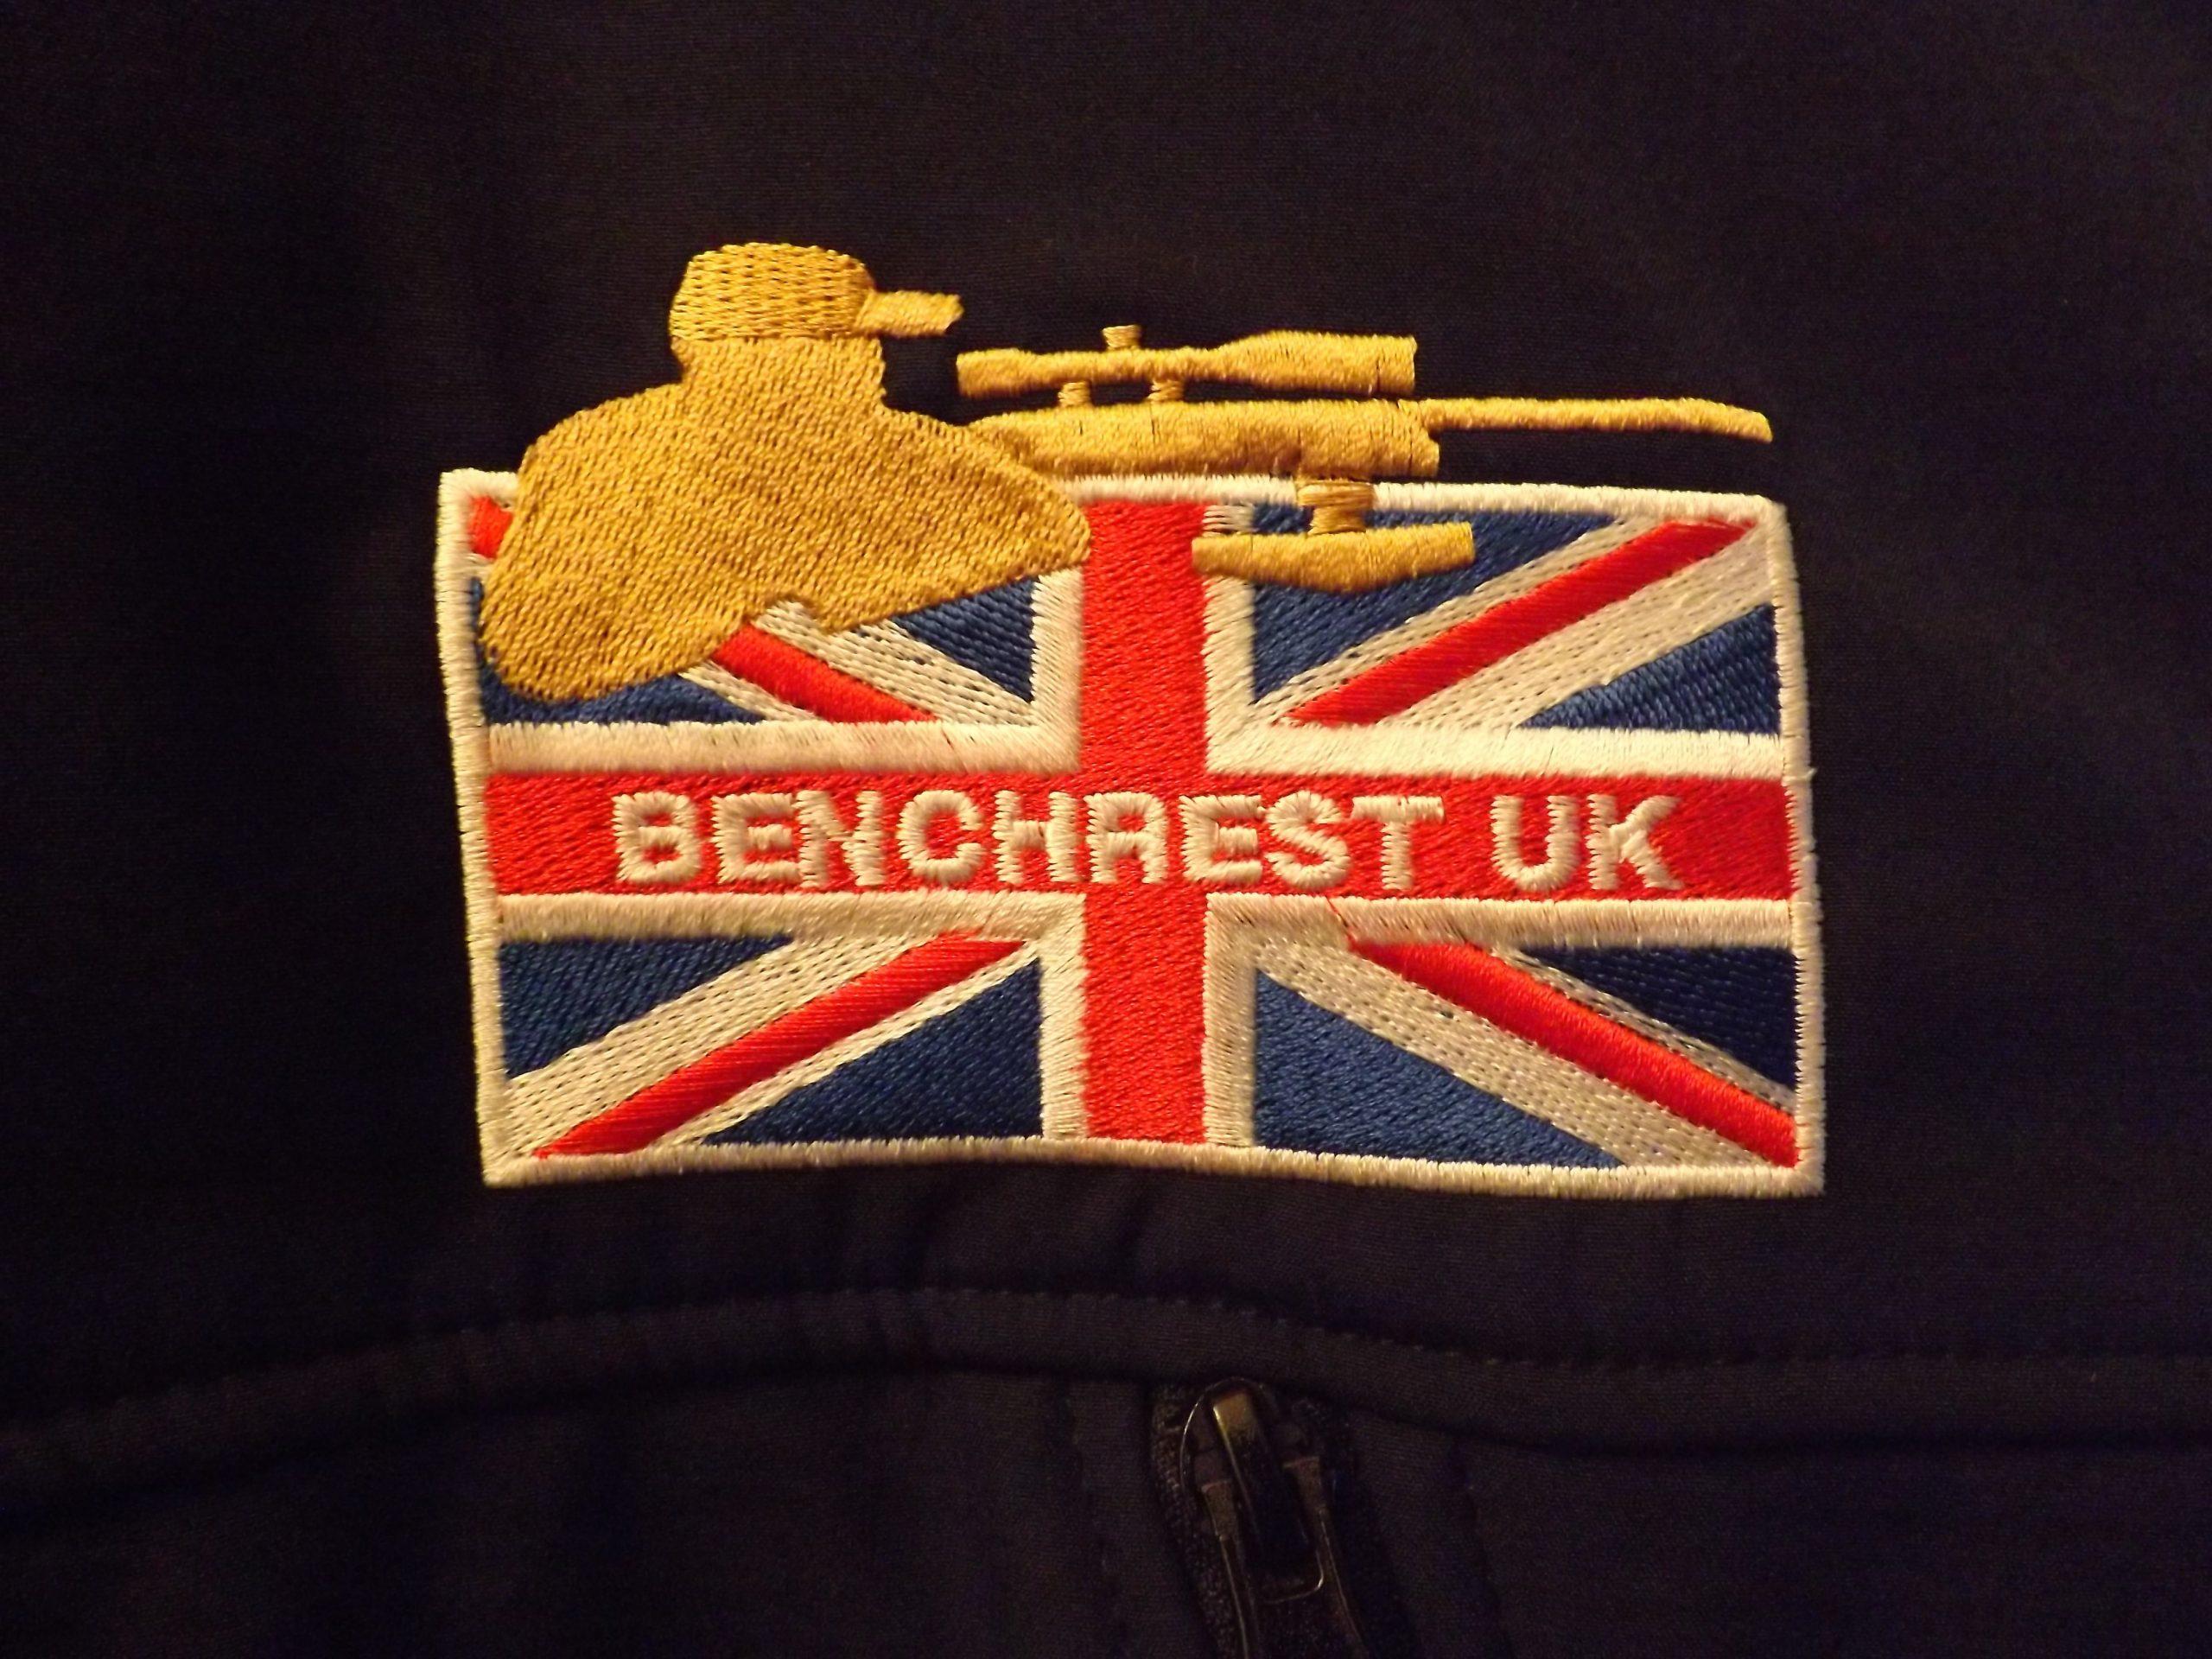 BENCHREST UK SOFT SHELL WATERPROOF BREATHABLE WINDPROOF BLUE JACKET